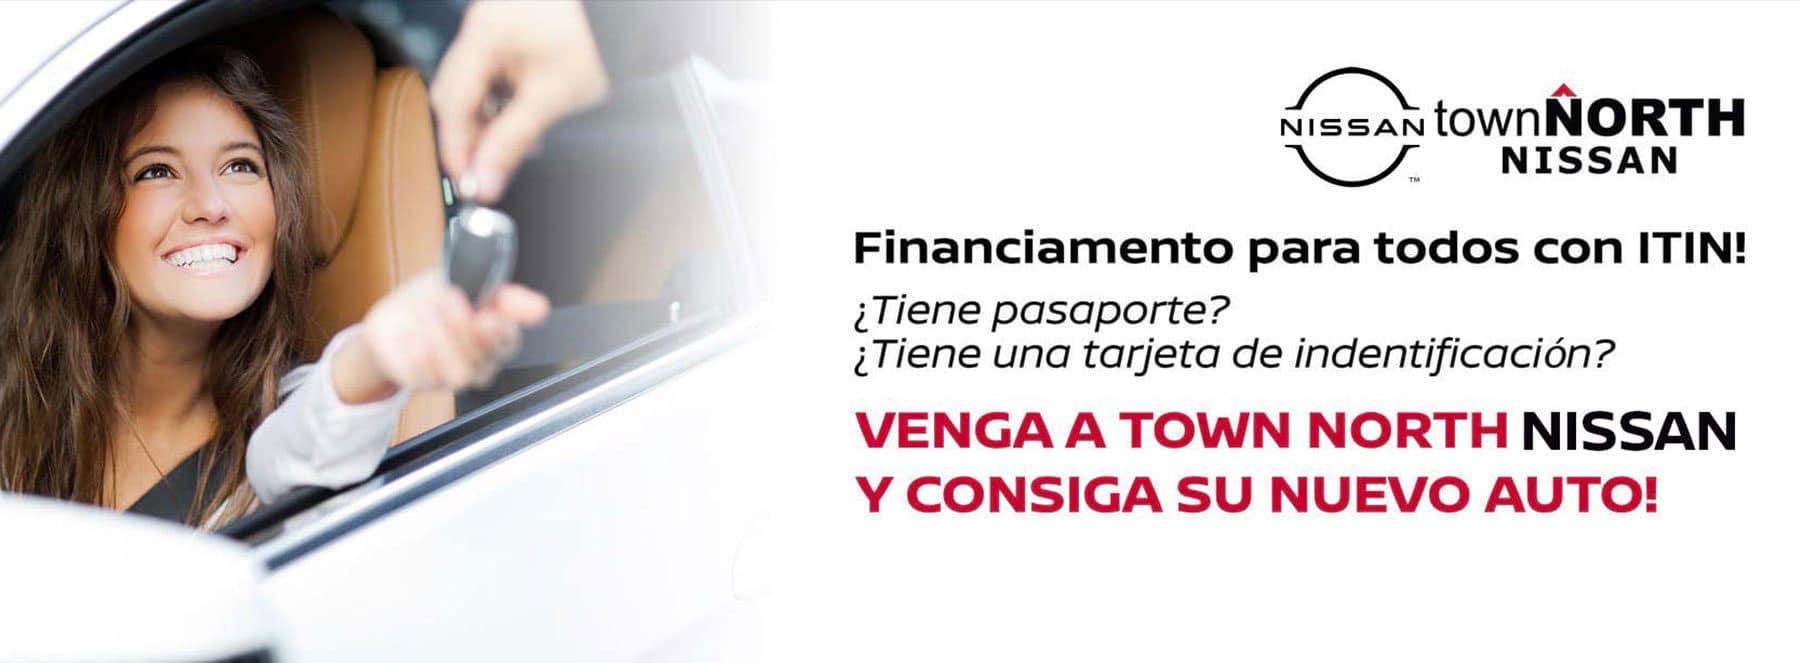 21APR_TNN_Spanish_WB_1800x663